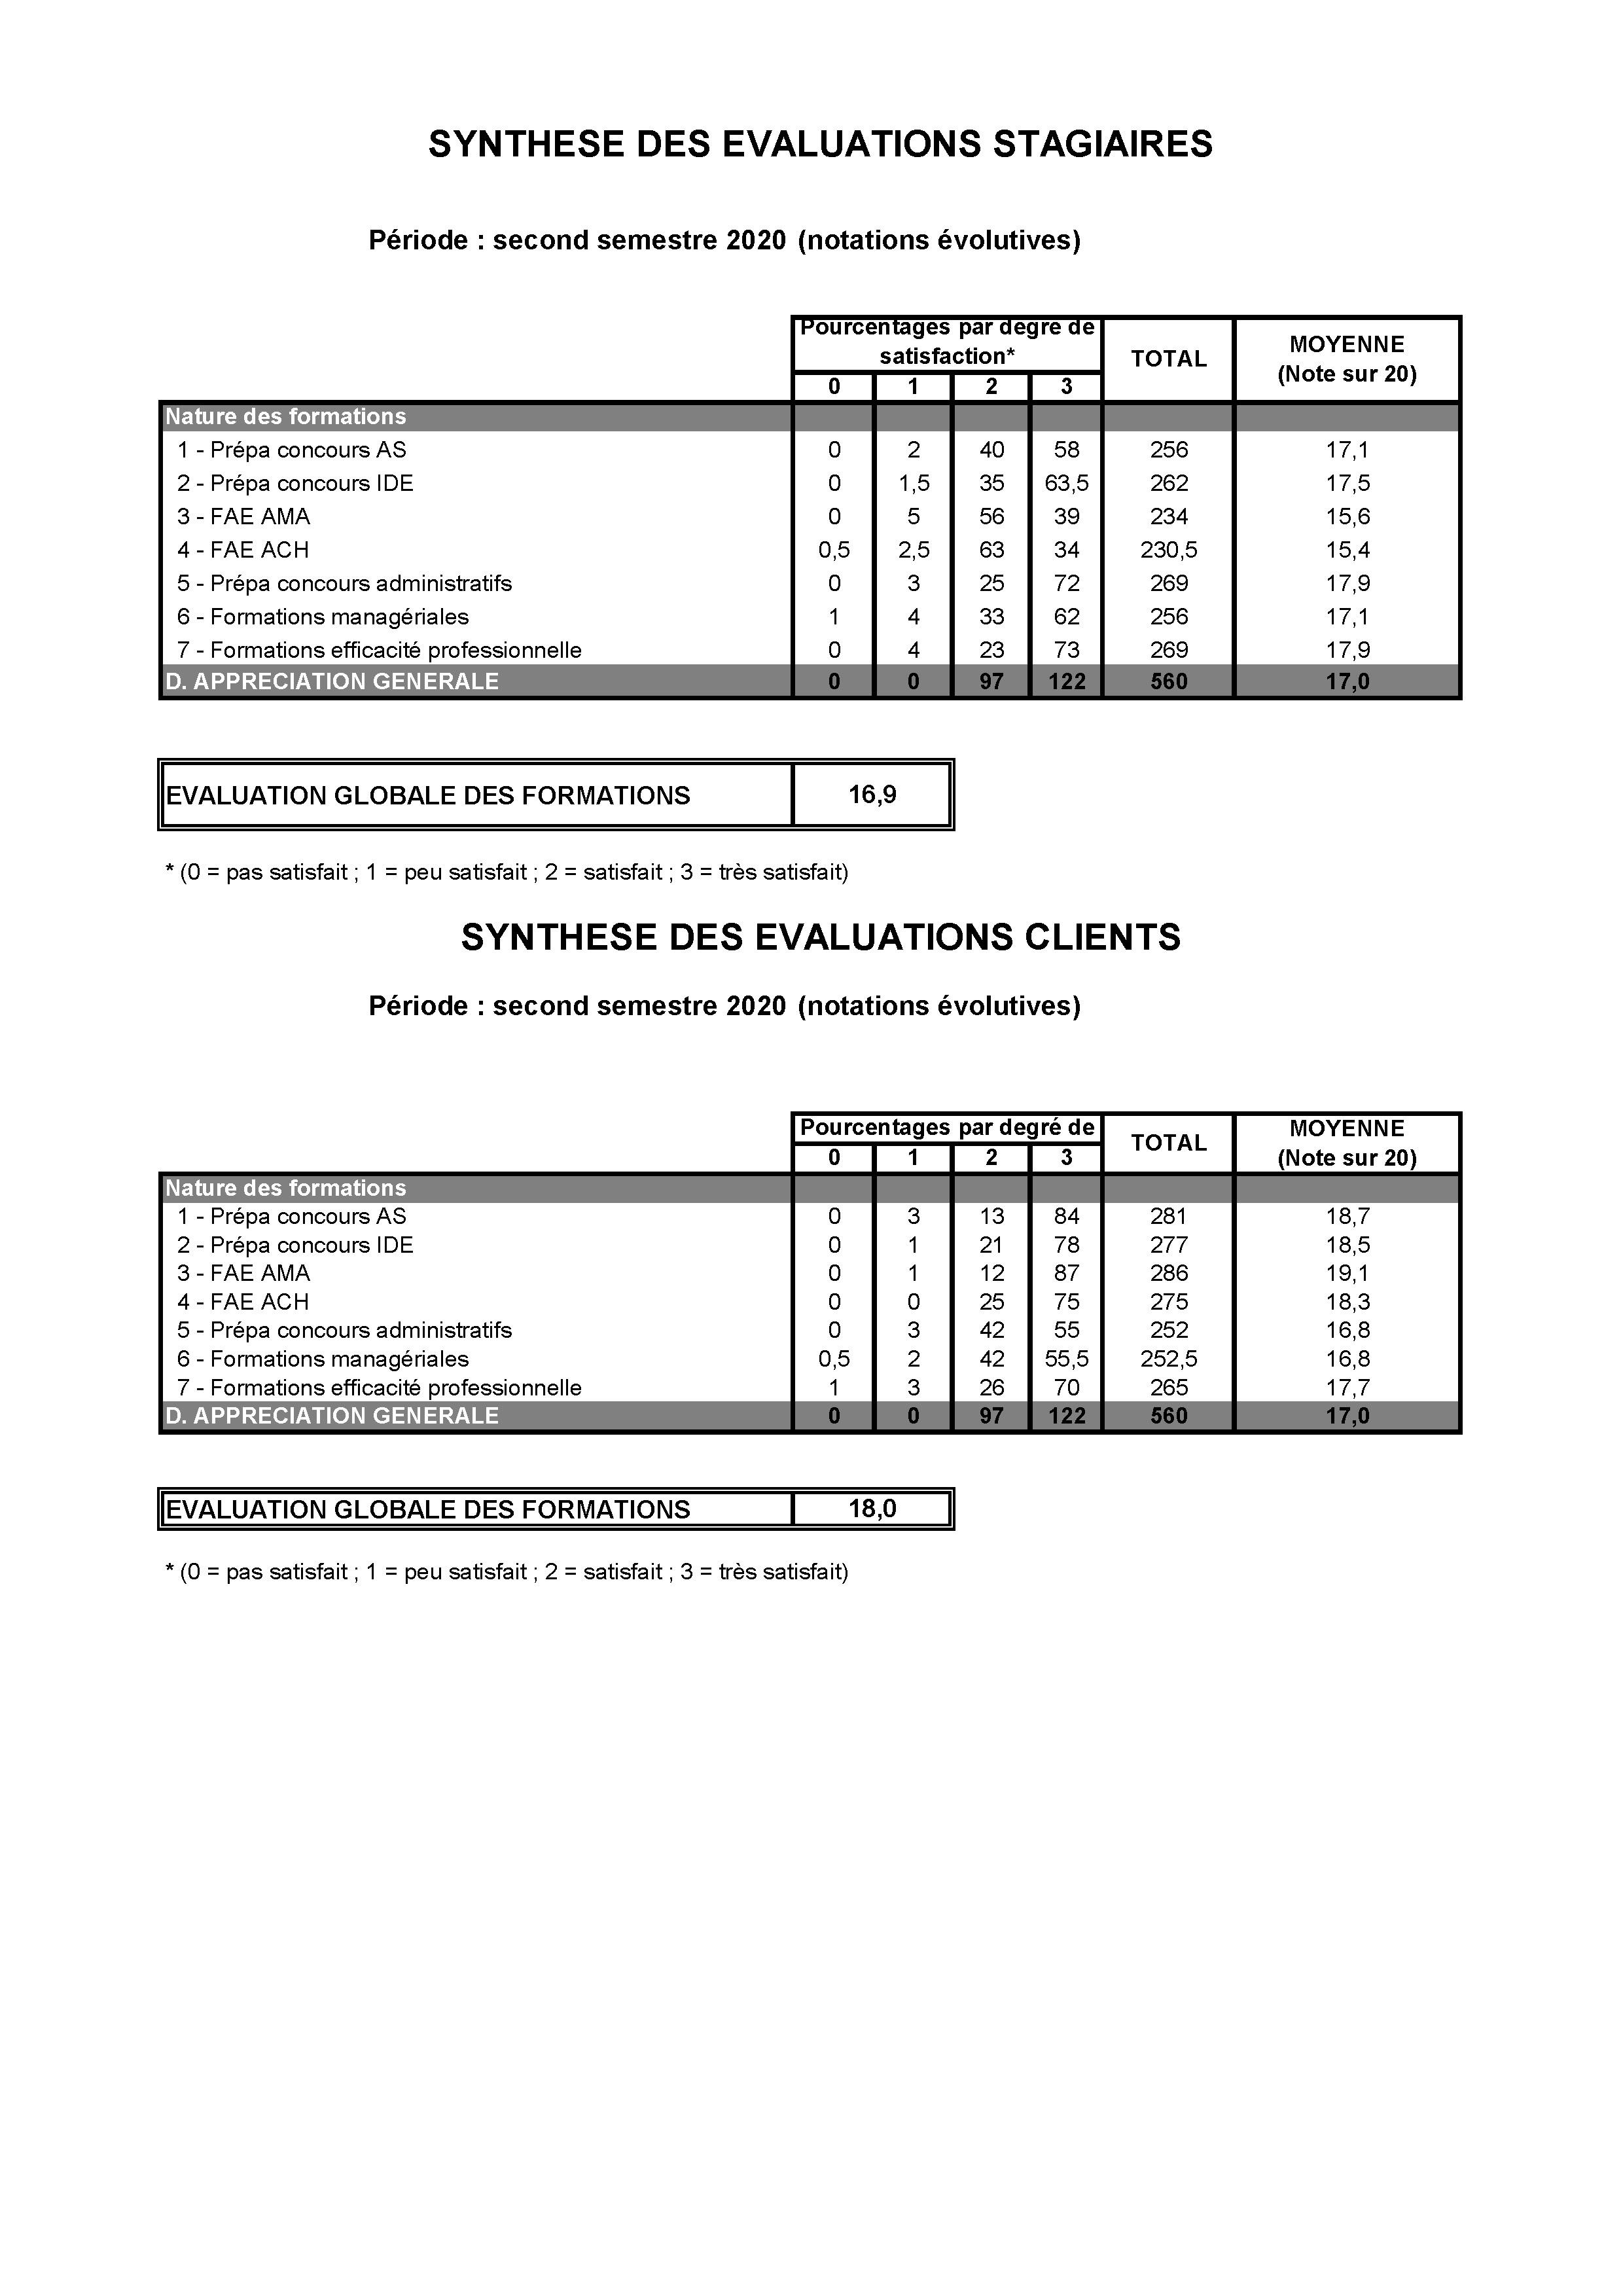 Convergences - Indice satisfaction